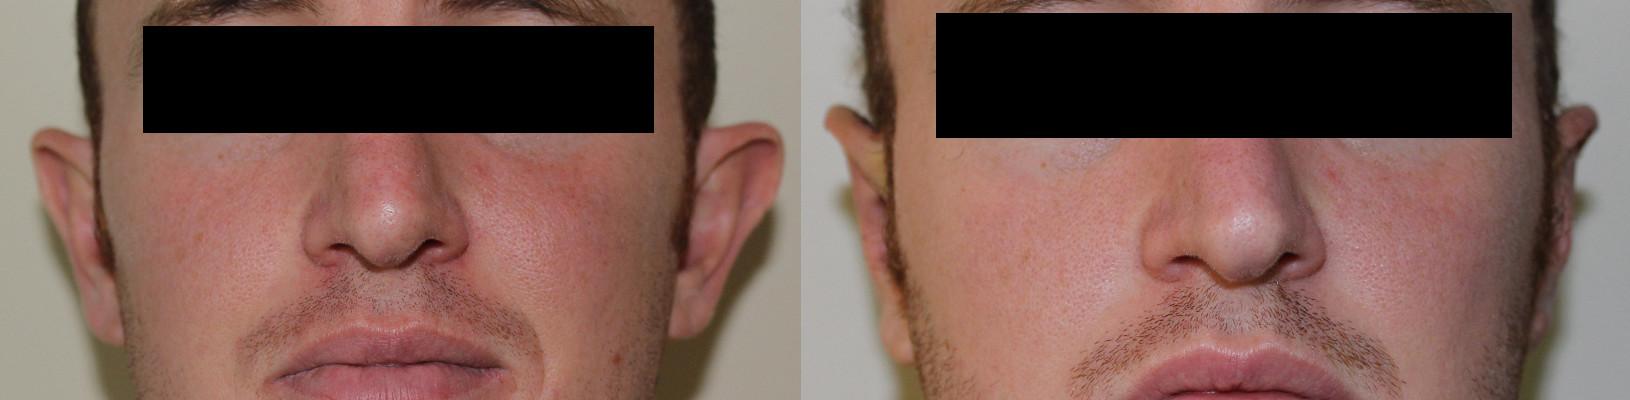 Ear Correction Case Study 31